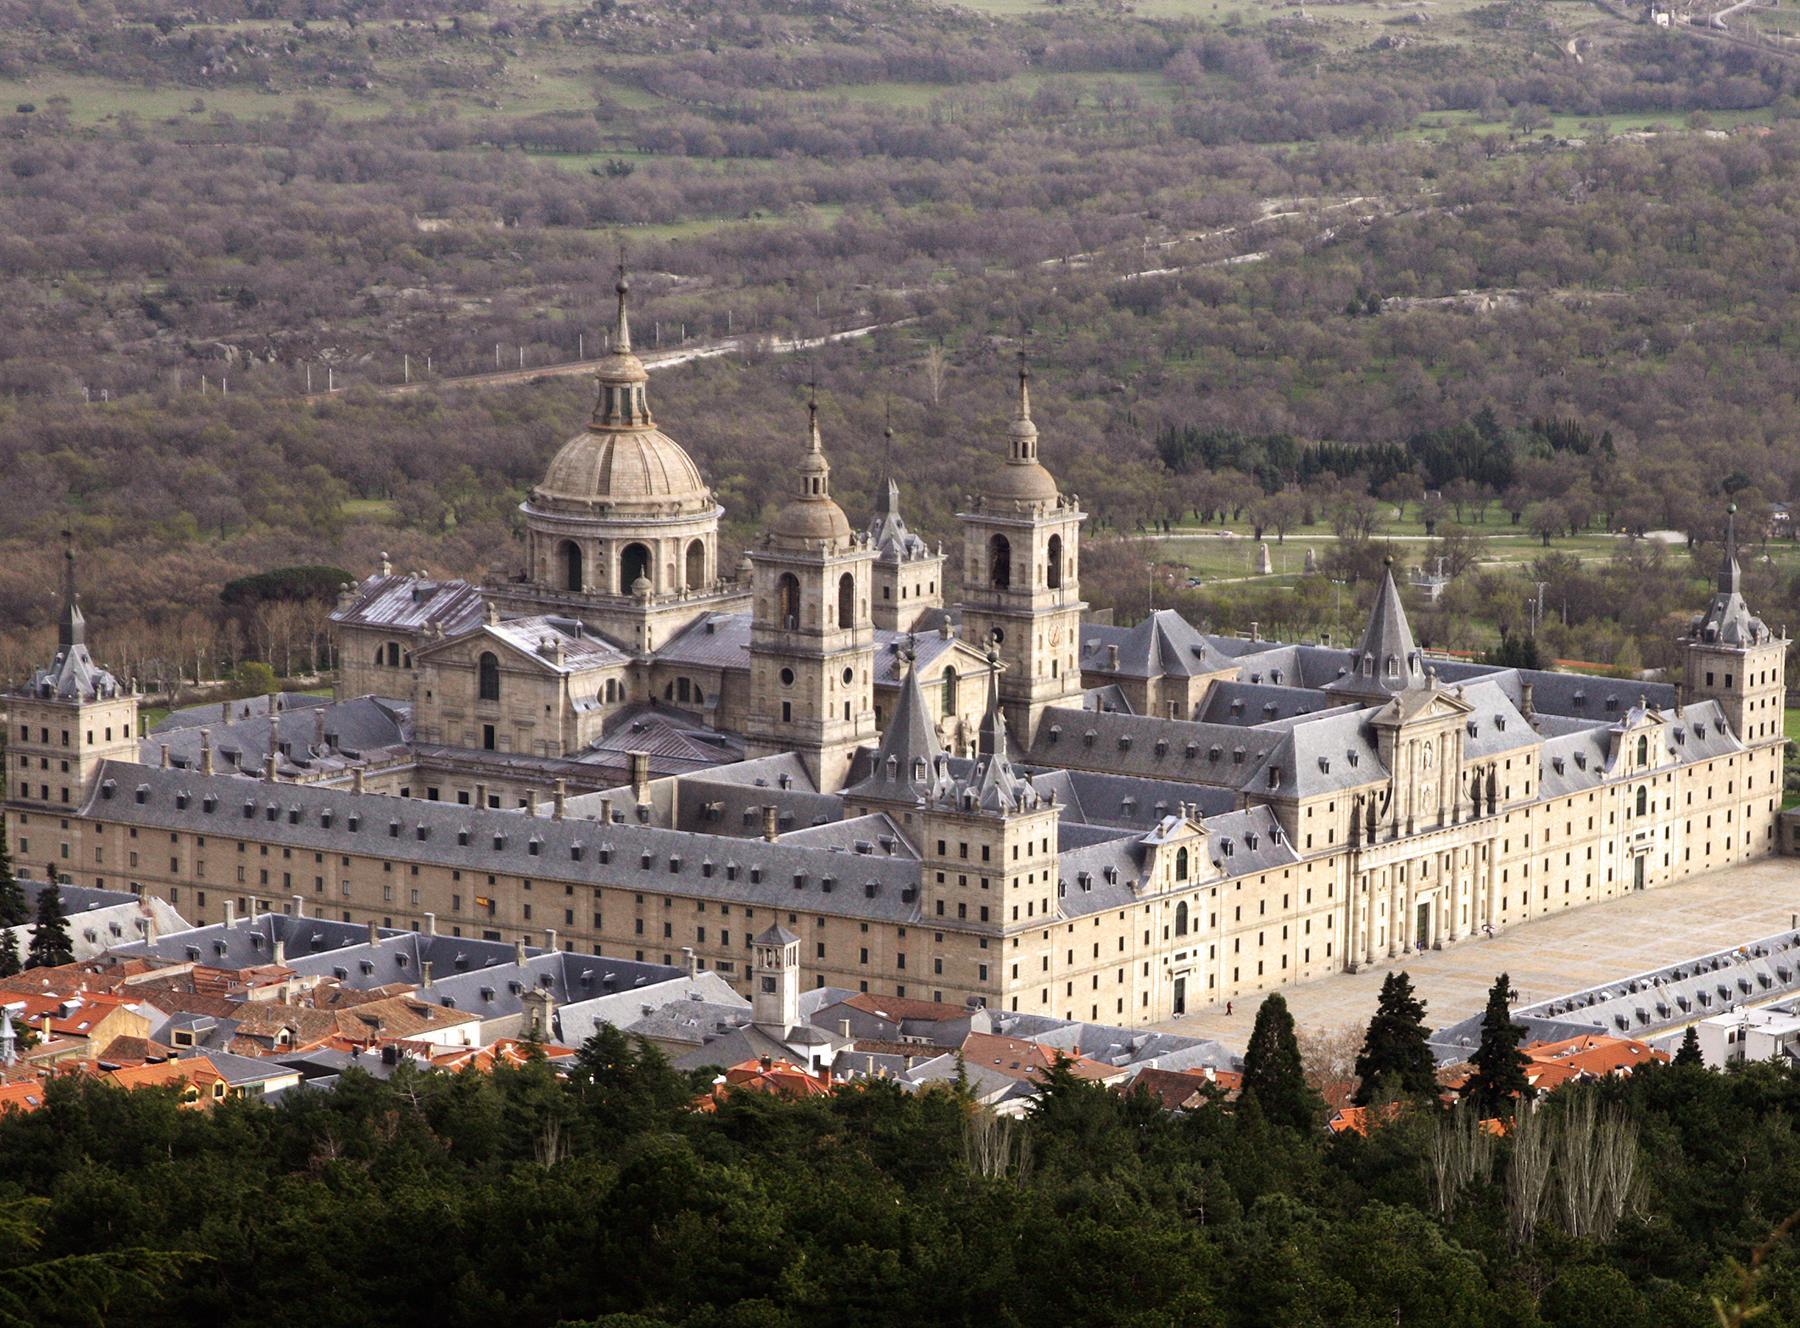 monastyr eskorial - Монастырь Эскориал